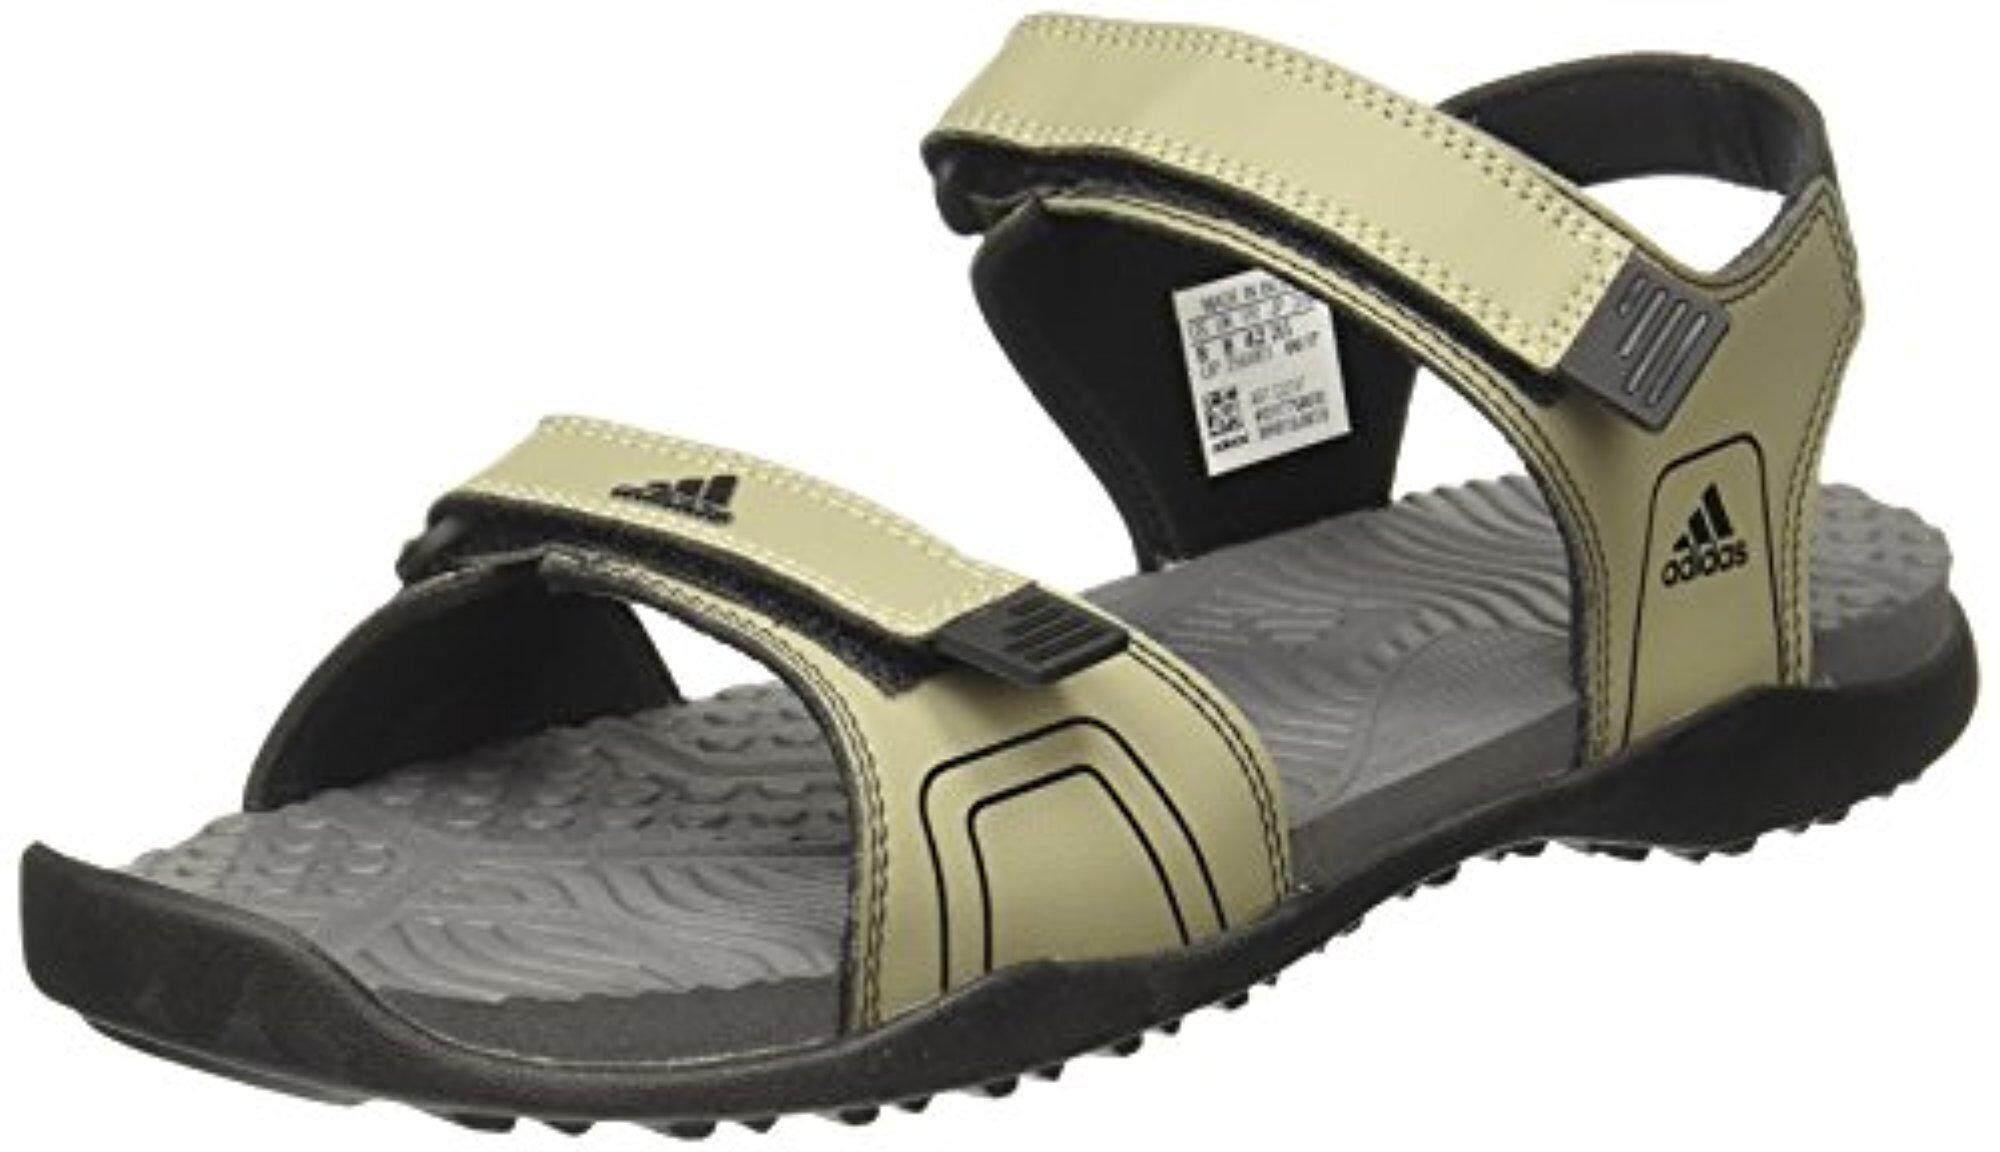 separation shoes b18bc 314ef Adidas Men s Gempen M Tracar Cblack Visgre Sandals and Floaters - 7 UK